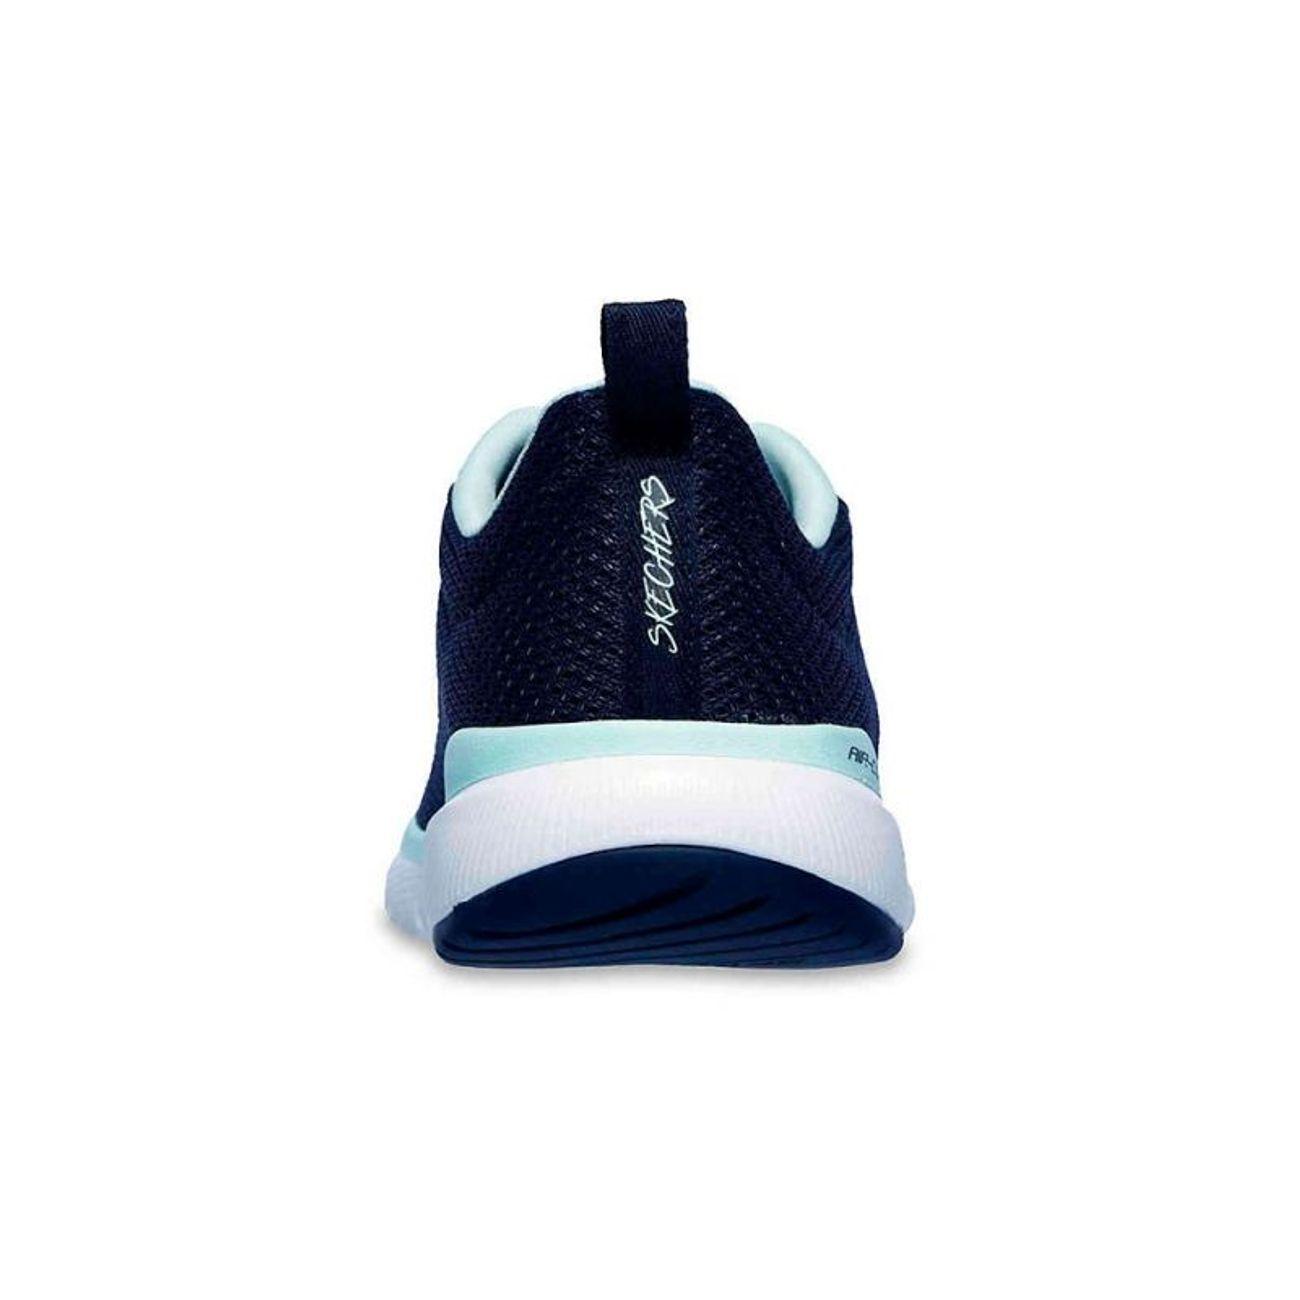 Noir 0 Padel 3 Bleu Nvaq Femme Skechers Flex Appeal Adulte Sk13070 6gyYbf7v